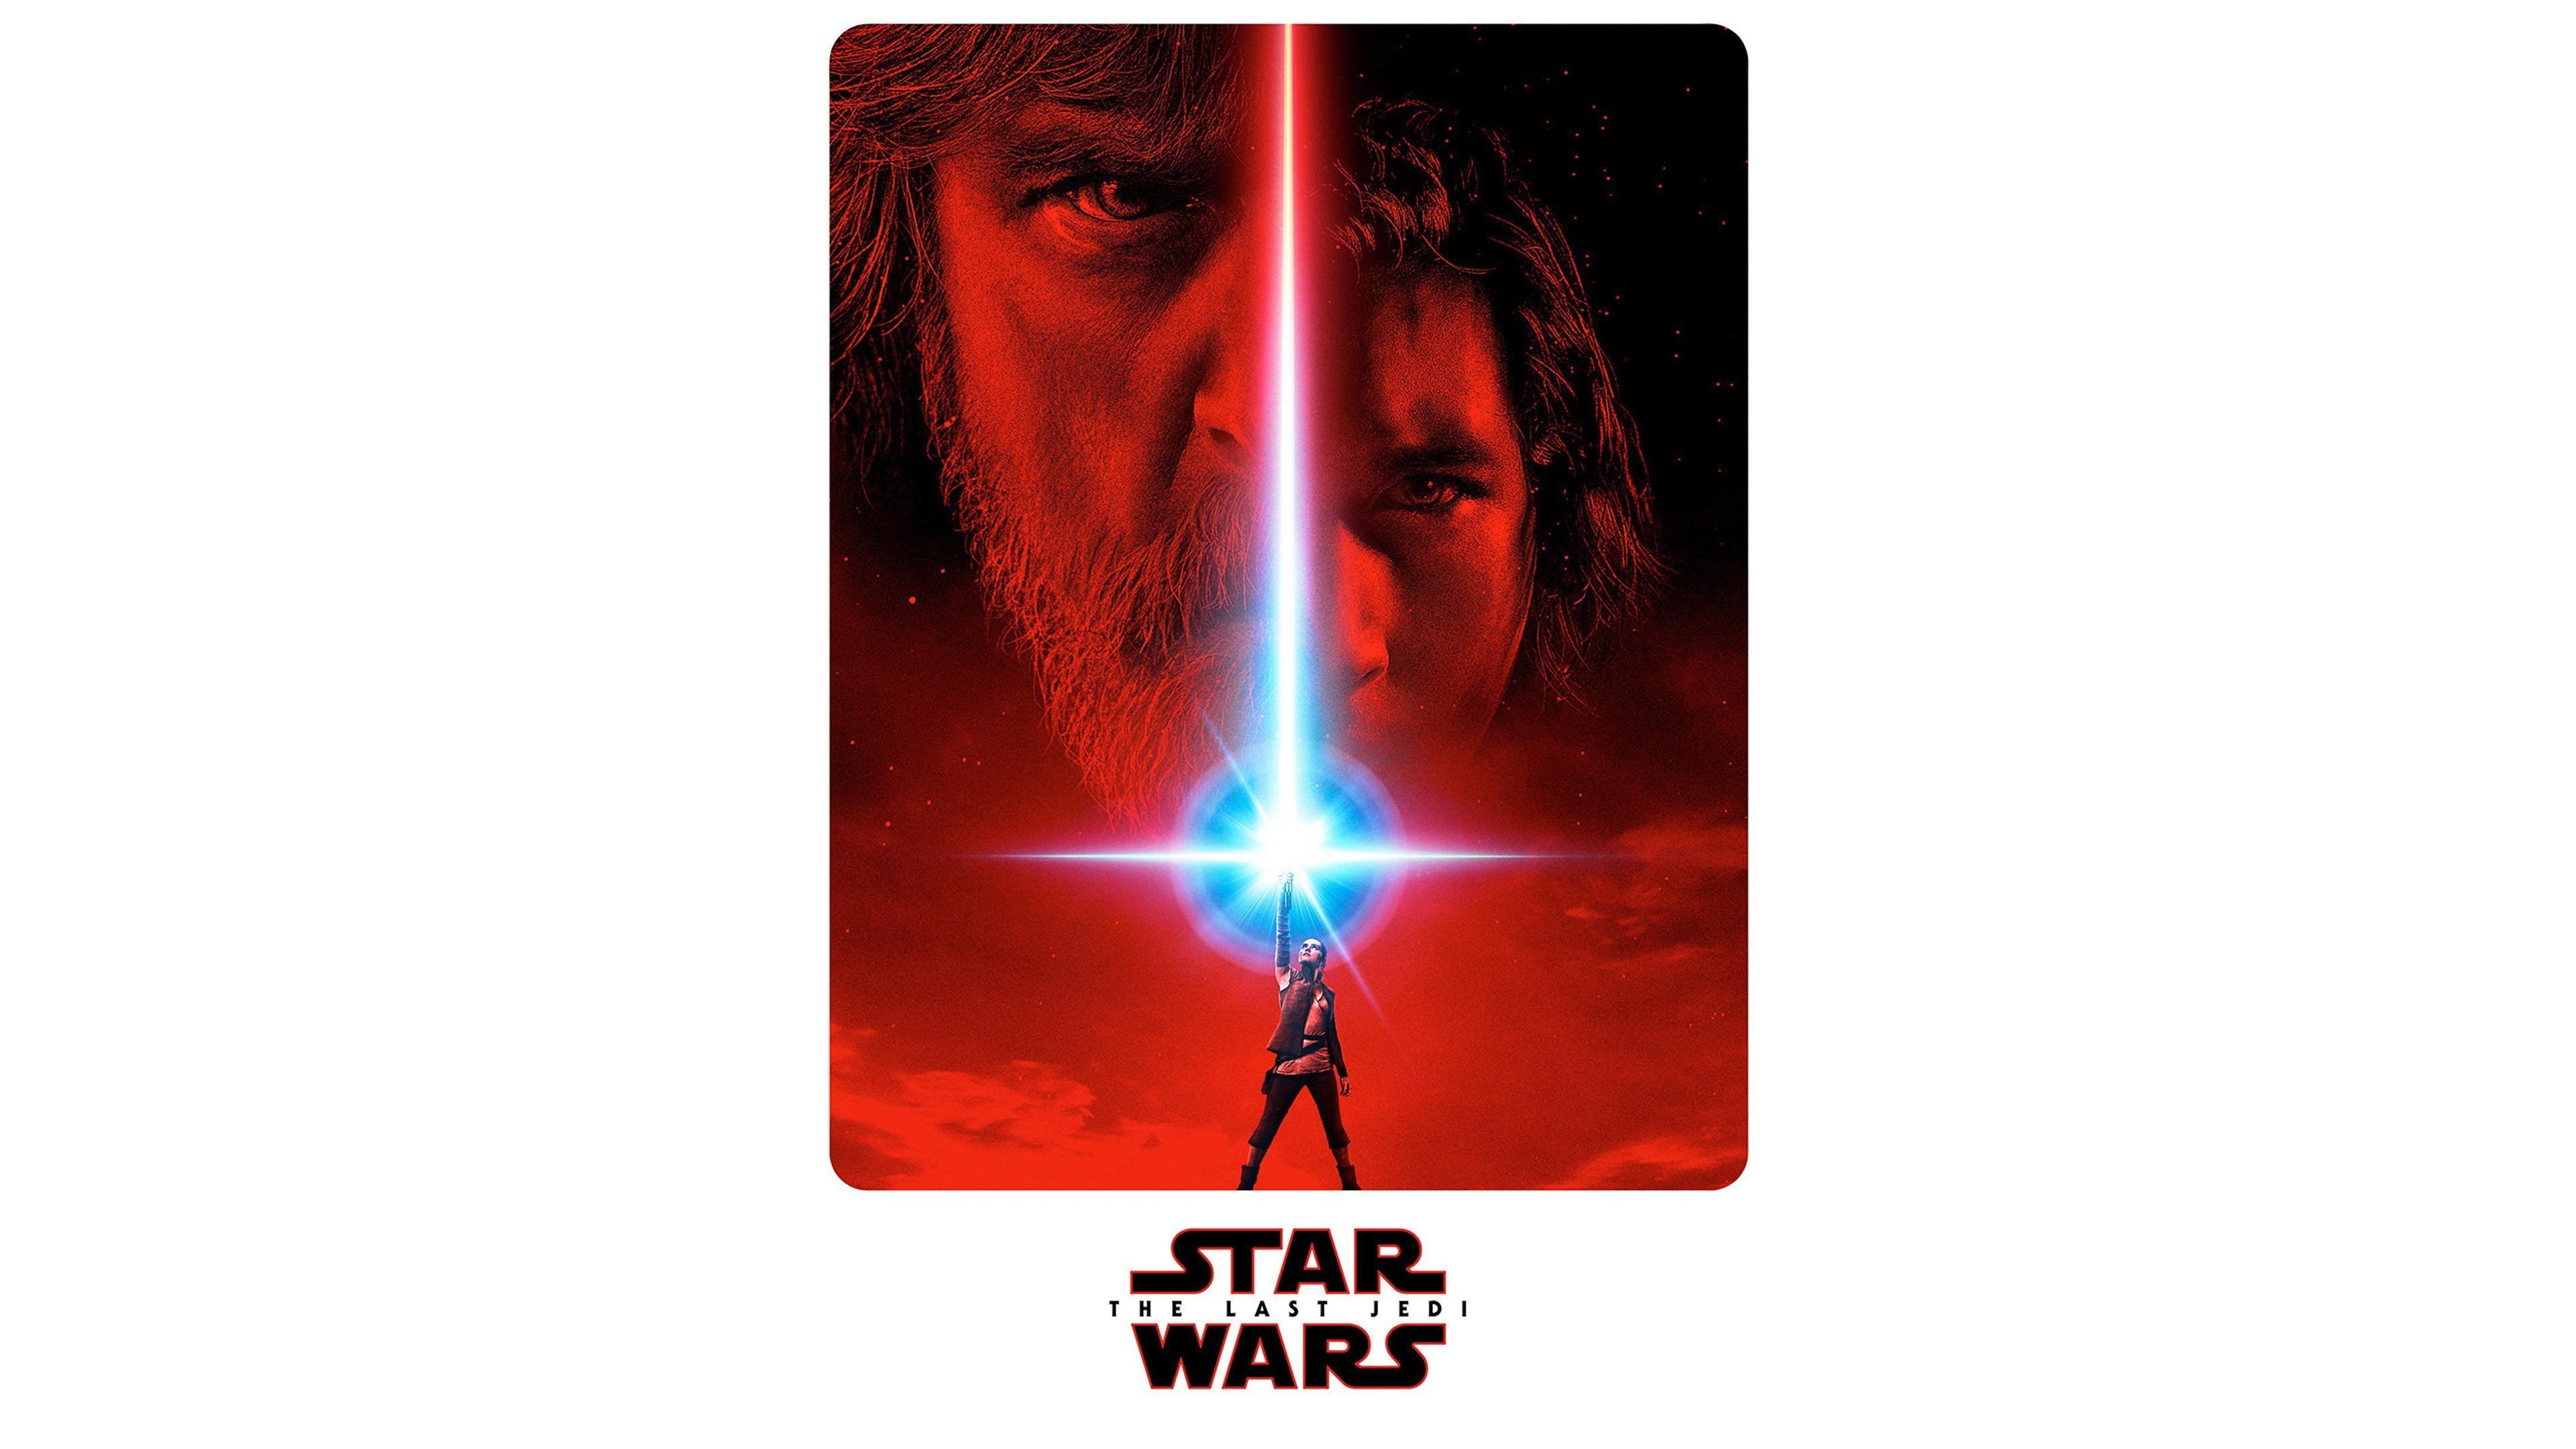 122 Rey Star Wars Hd